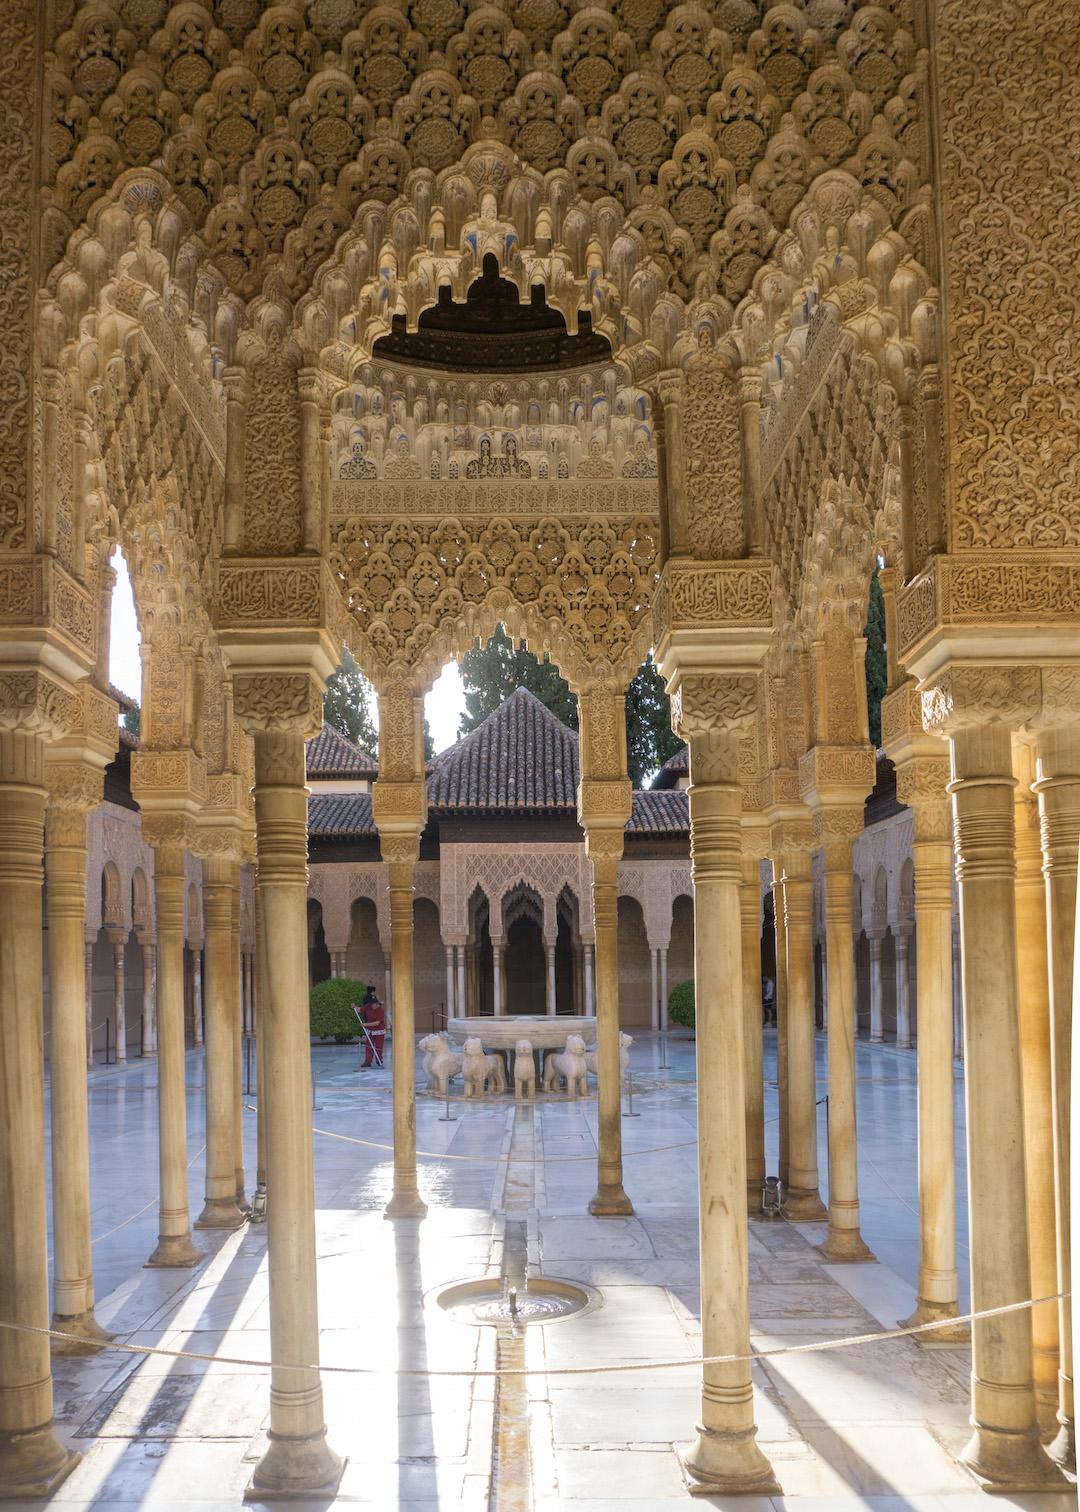 Her_Travel_Edit_Granada_Nasrid_Palace